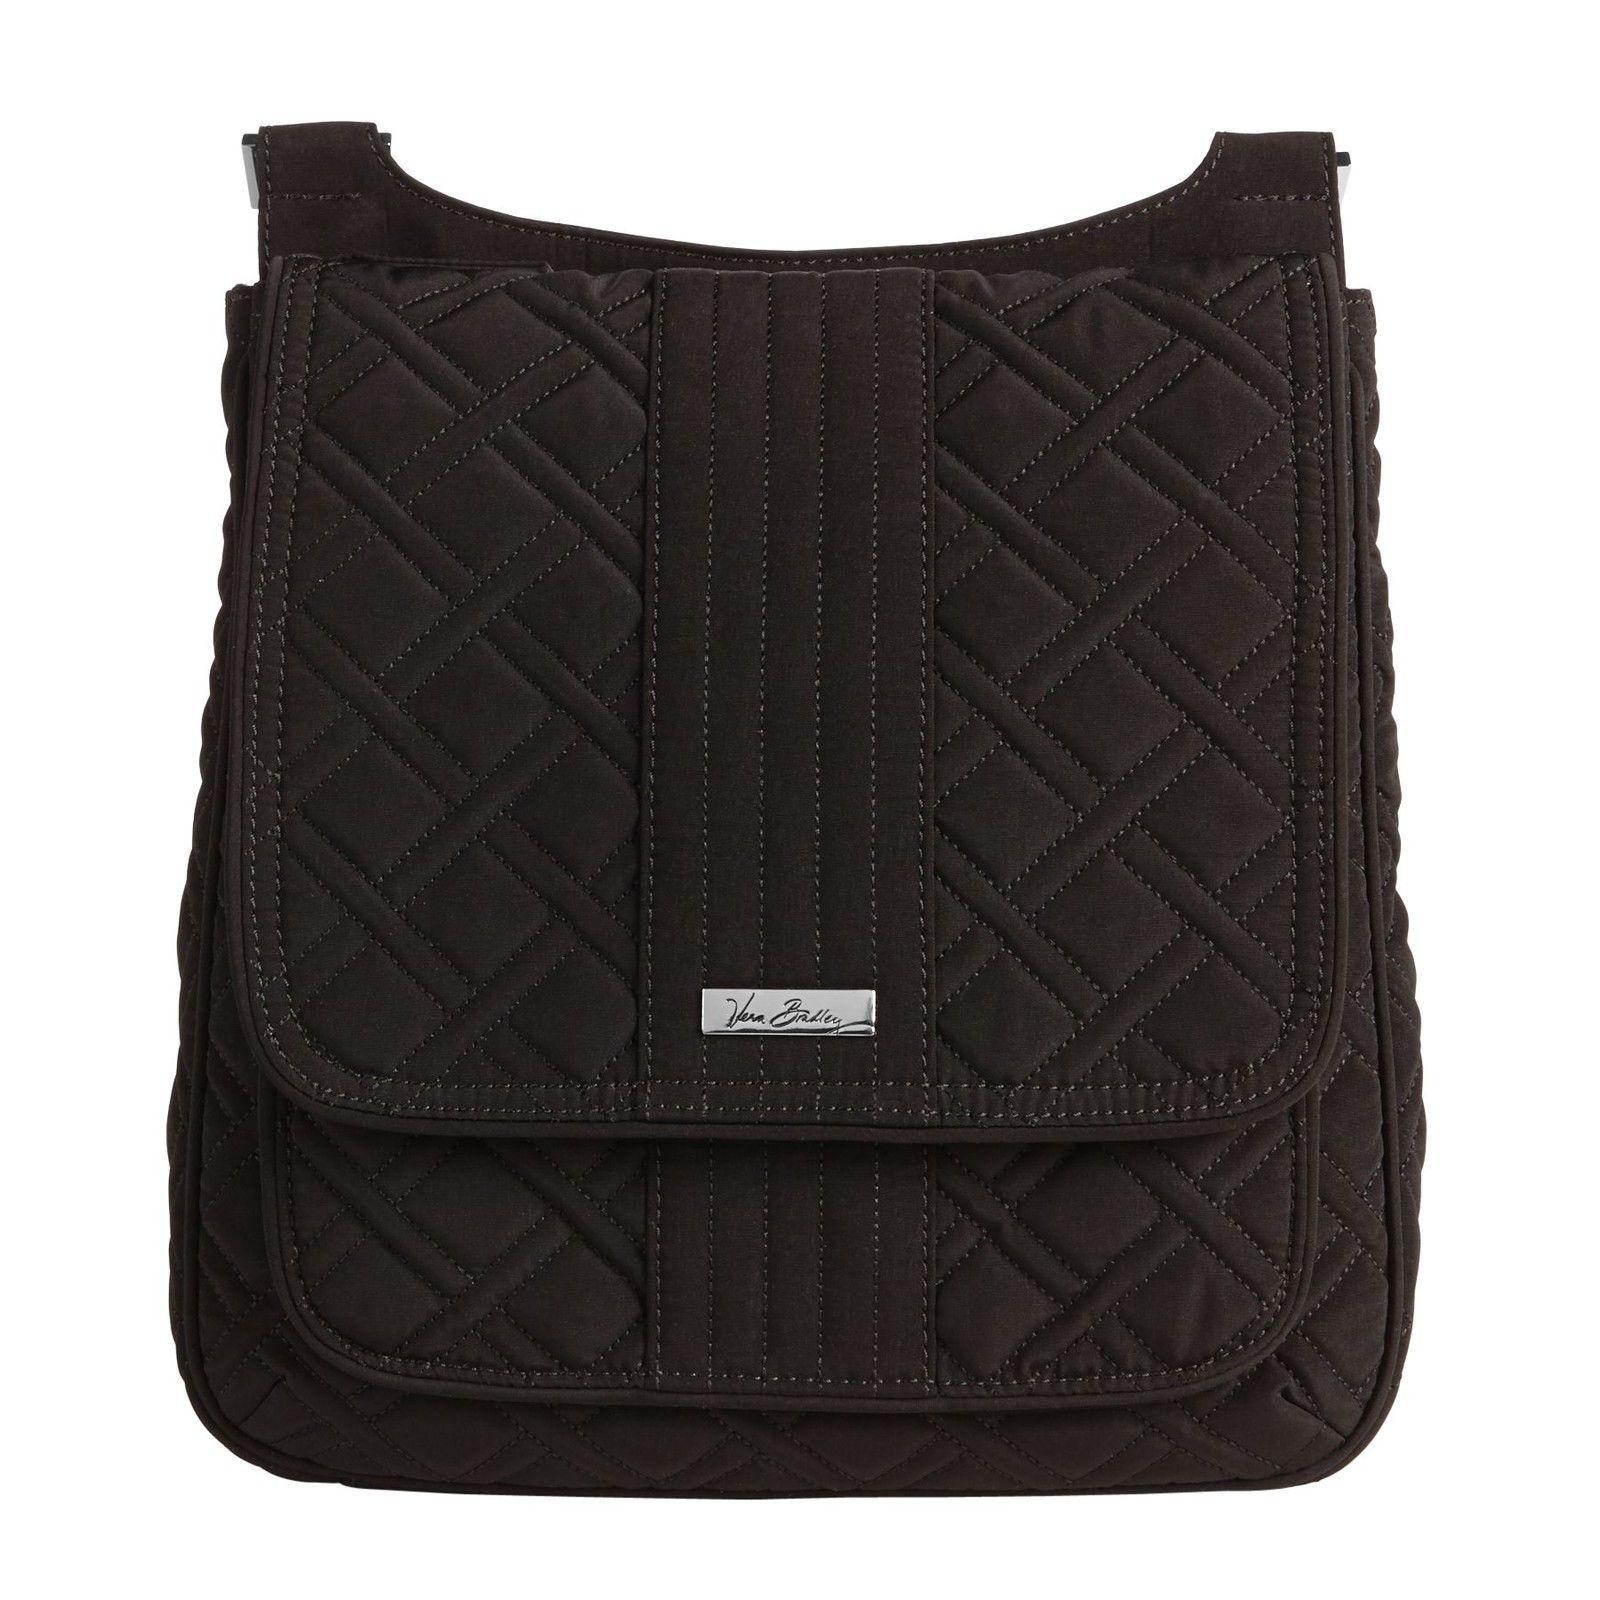 Vera Bradley Microfiber Mailbag Crossbody Bag in Classic Black ... e2657f0d7591d